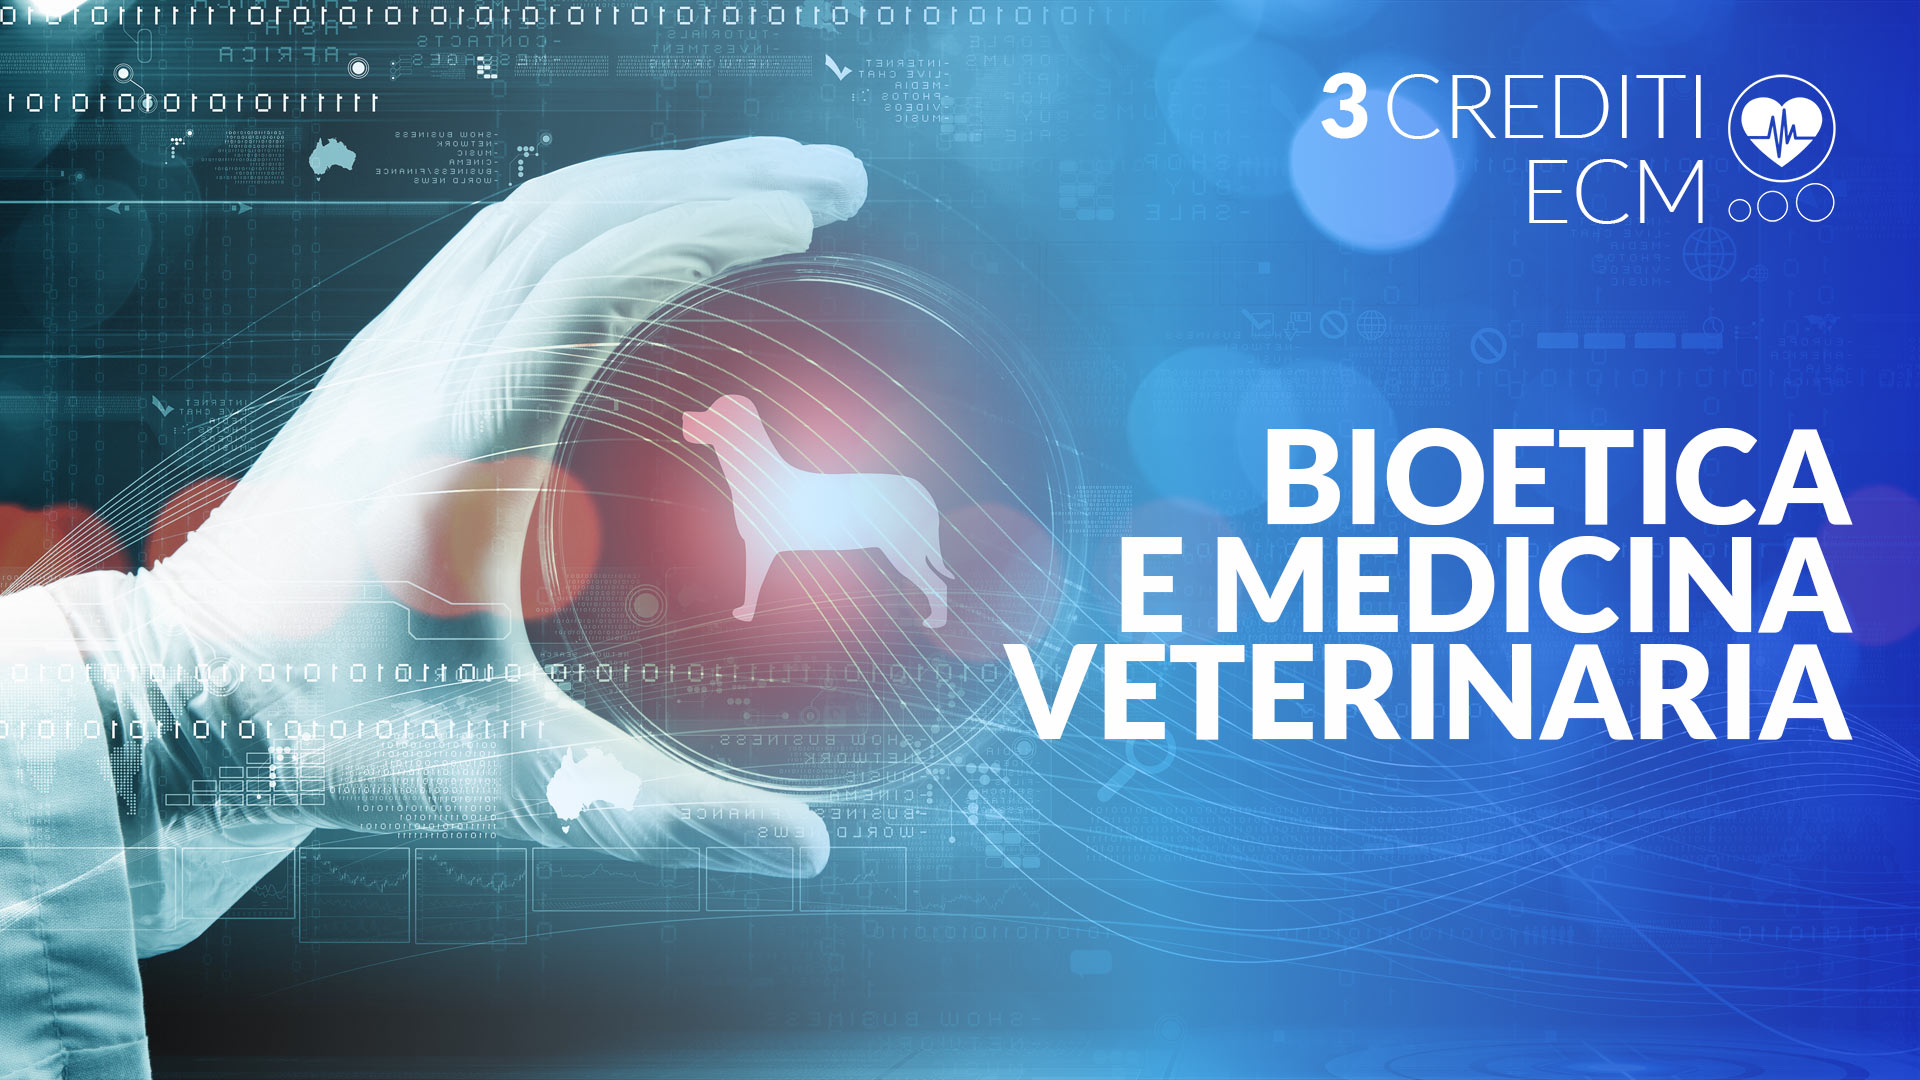 Bioetica e medicina veterinaria